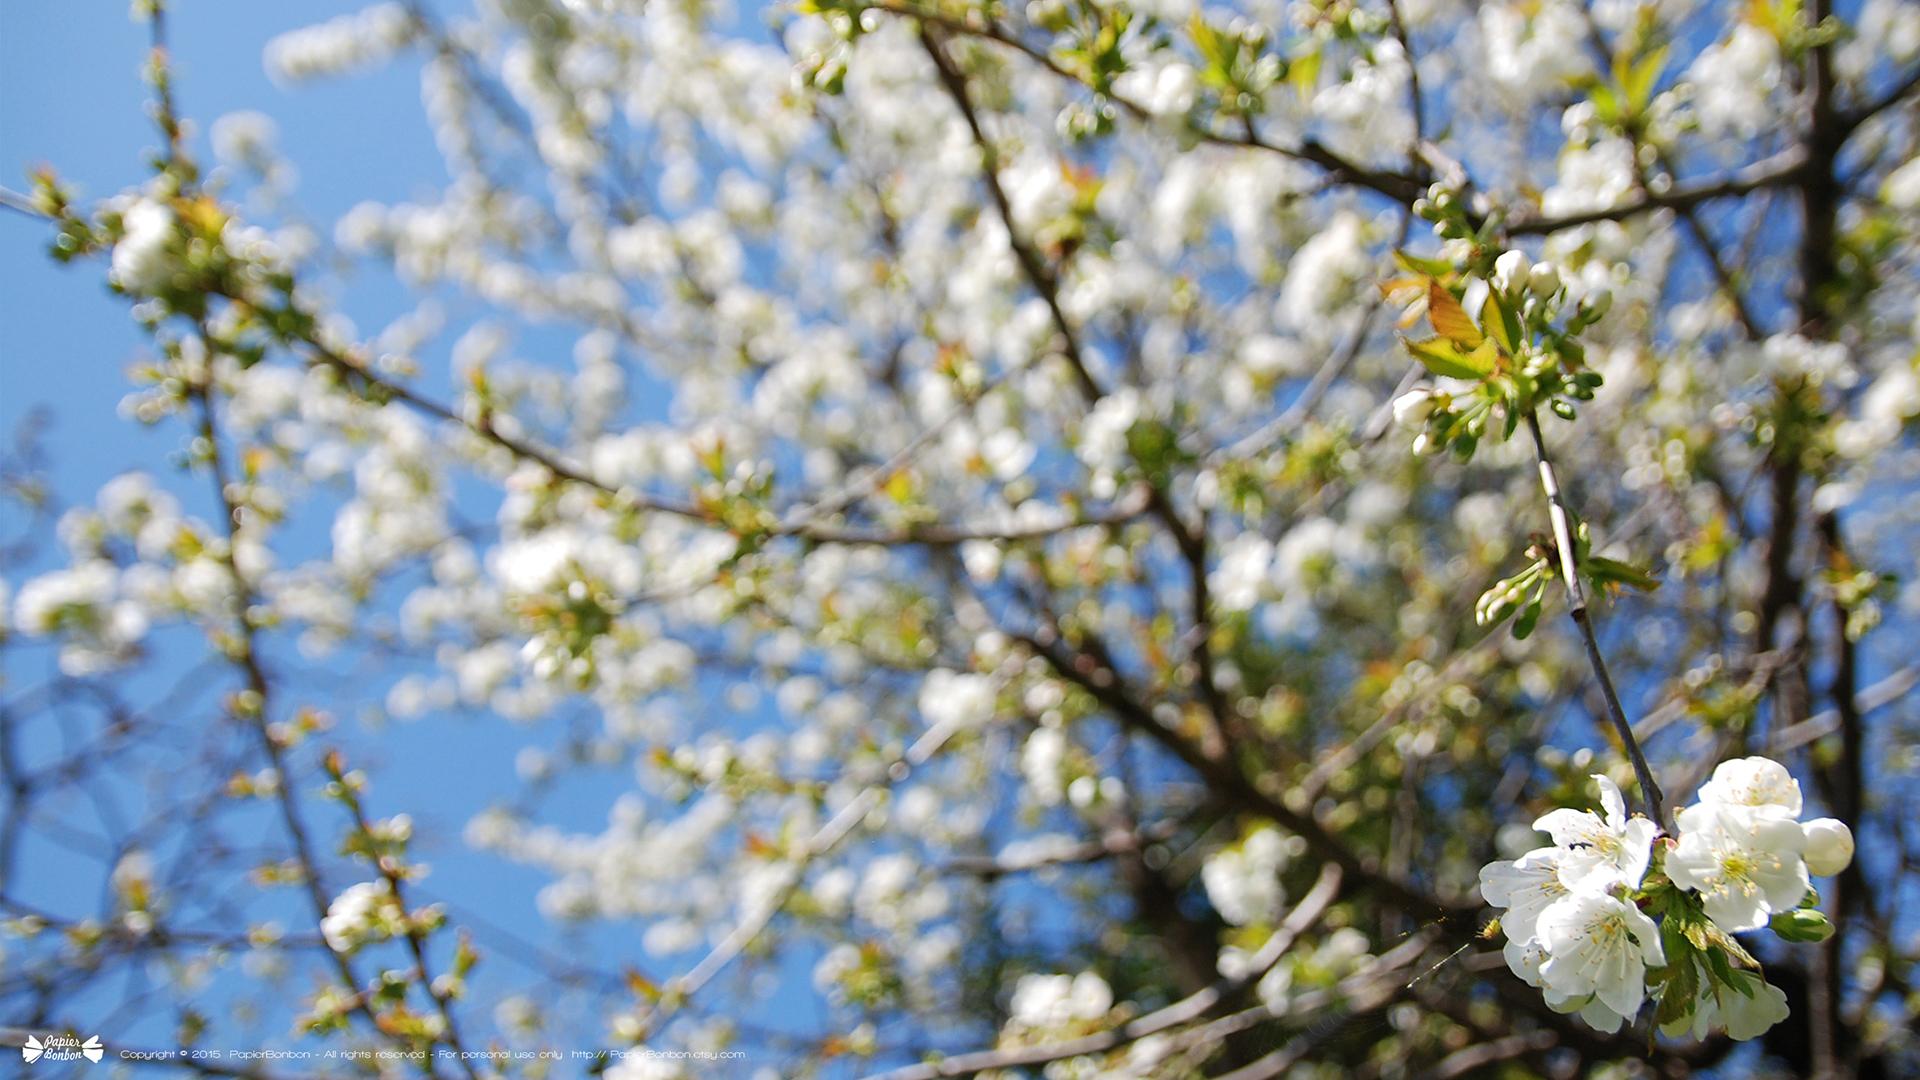 14 sunny desktop wallpapers - Springtime desktop wallpapers - Papier Bonbon